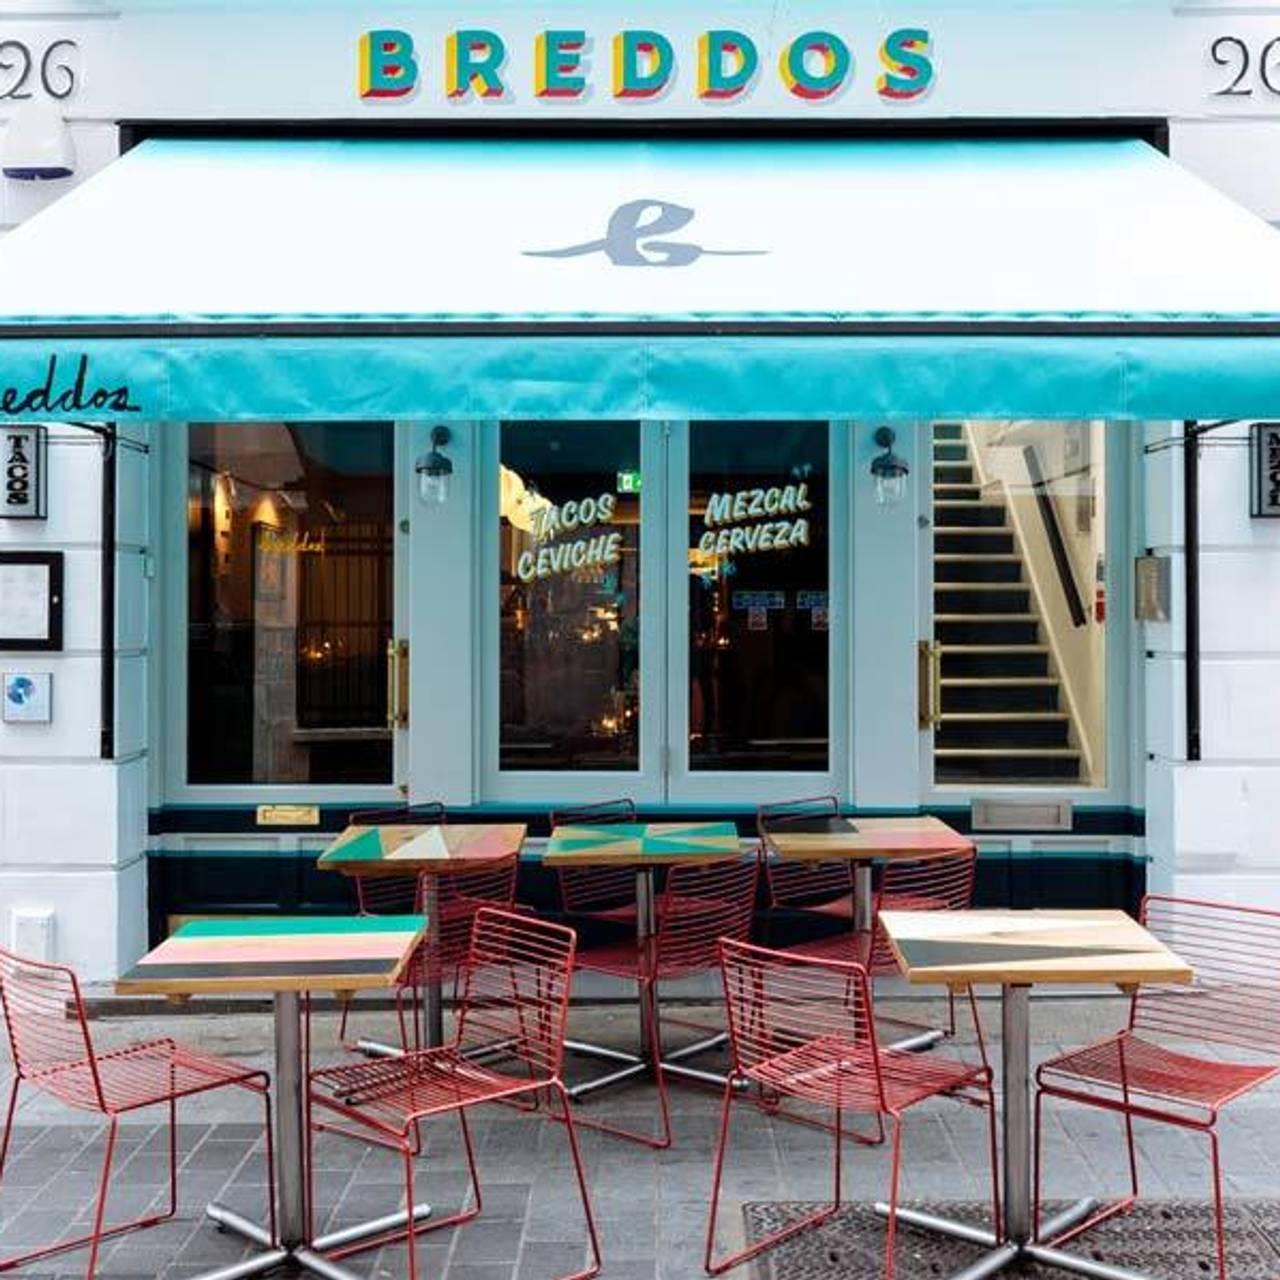 Breddos Tacos Soho Restaurant - London,   OpenTable